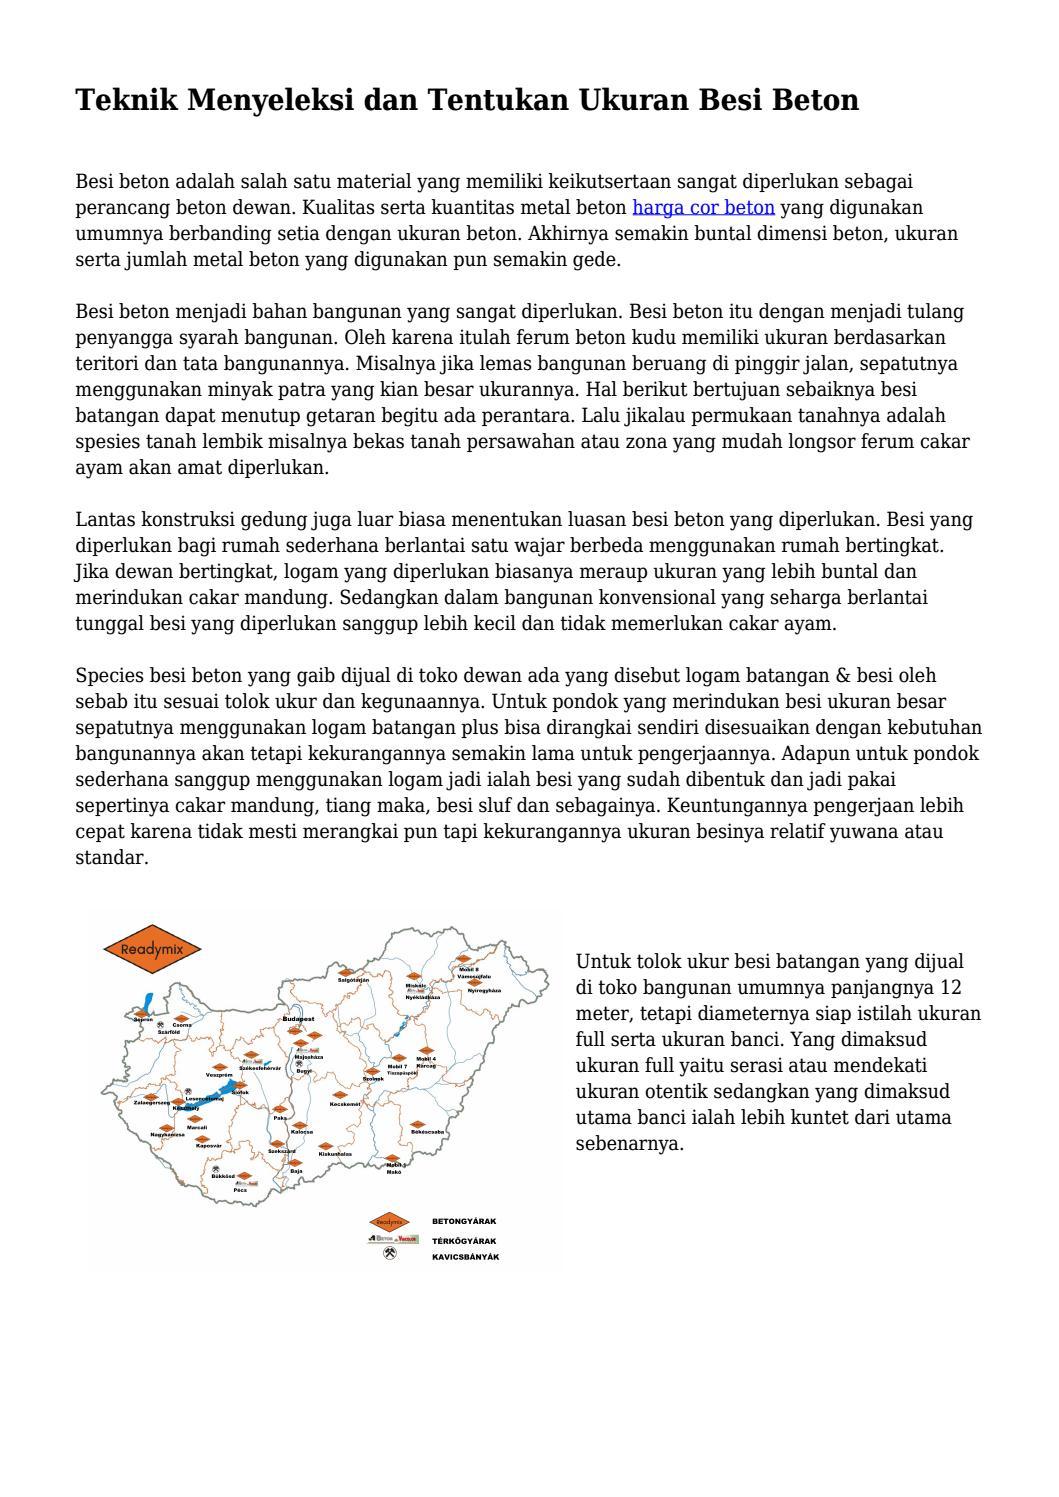 Teknik Menyeleksi Dan Tentukan Ukuran Besi Beton By Pinbisniscorp Issuu